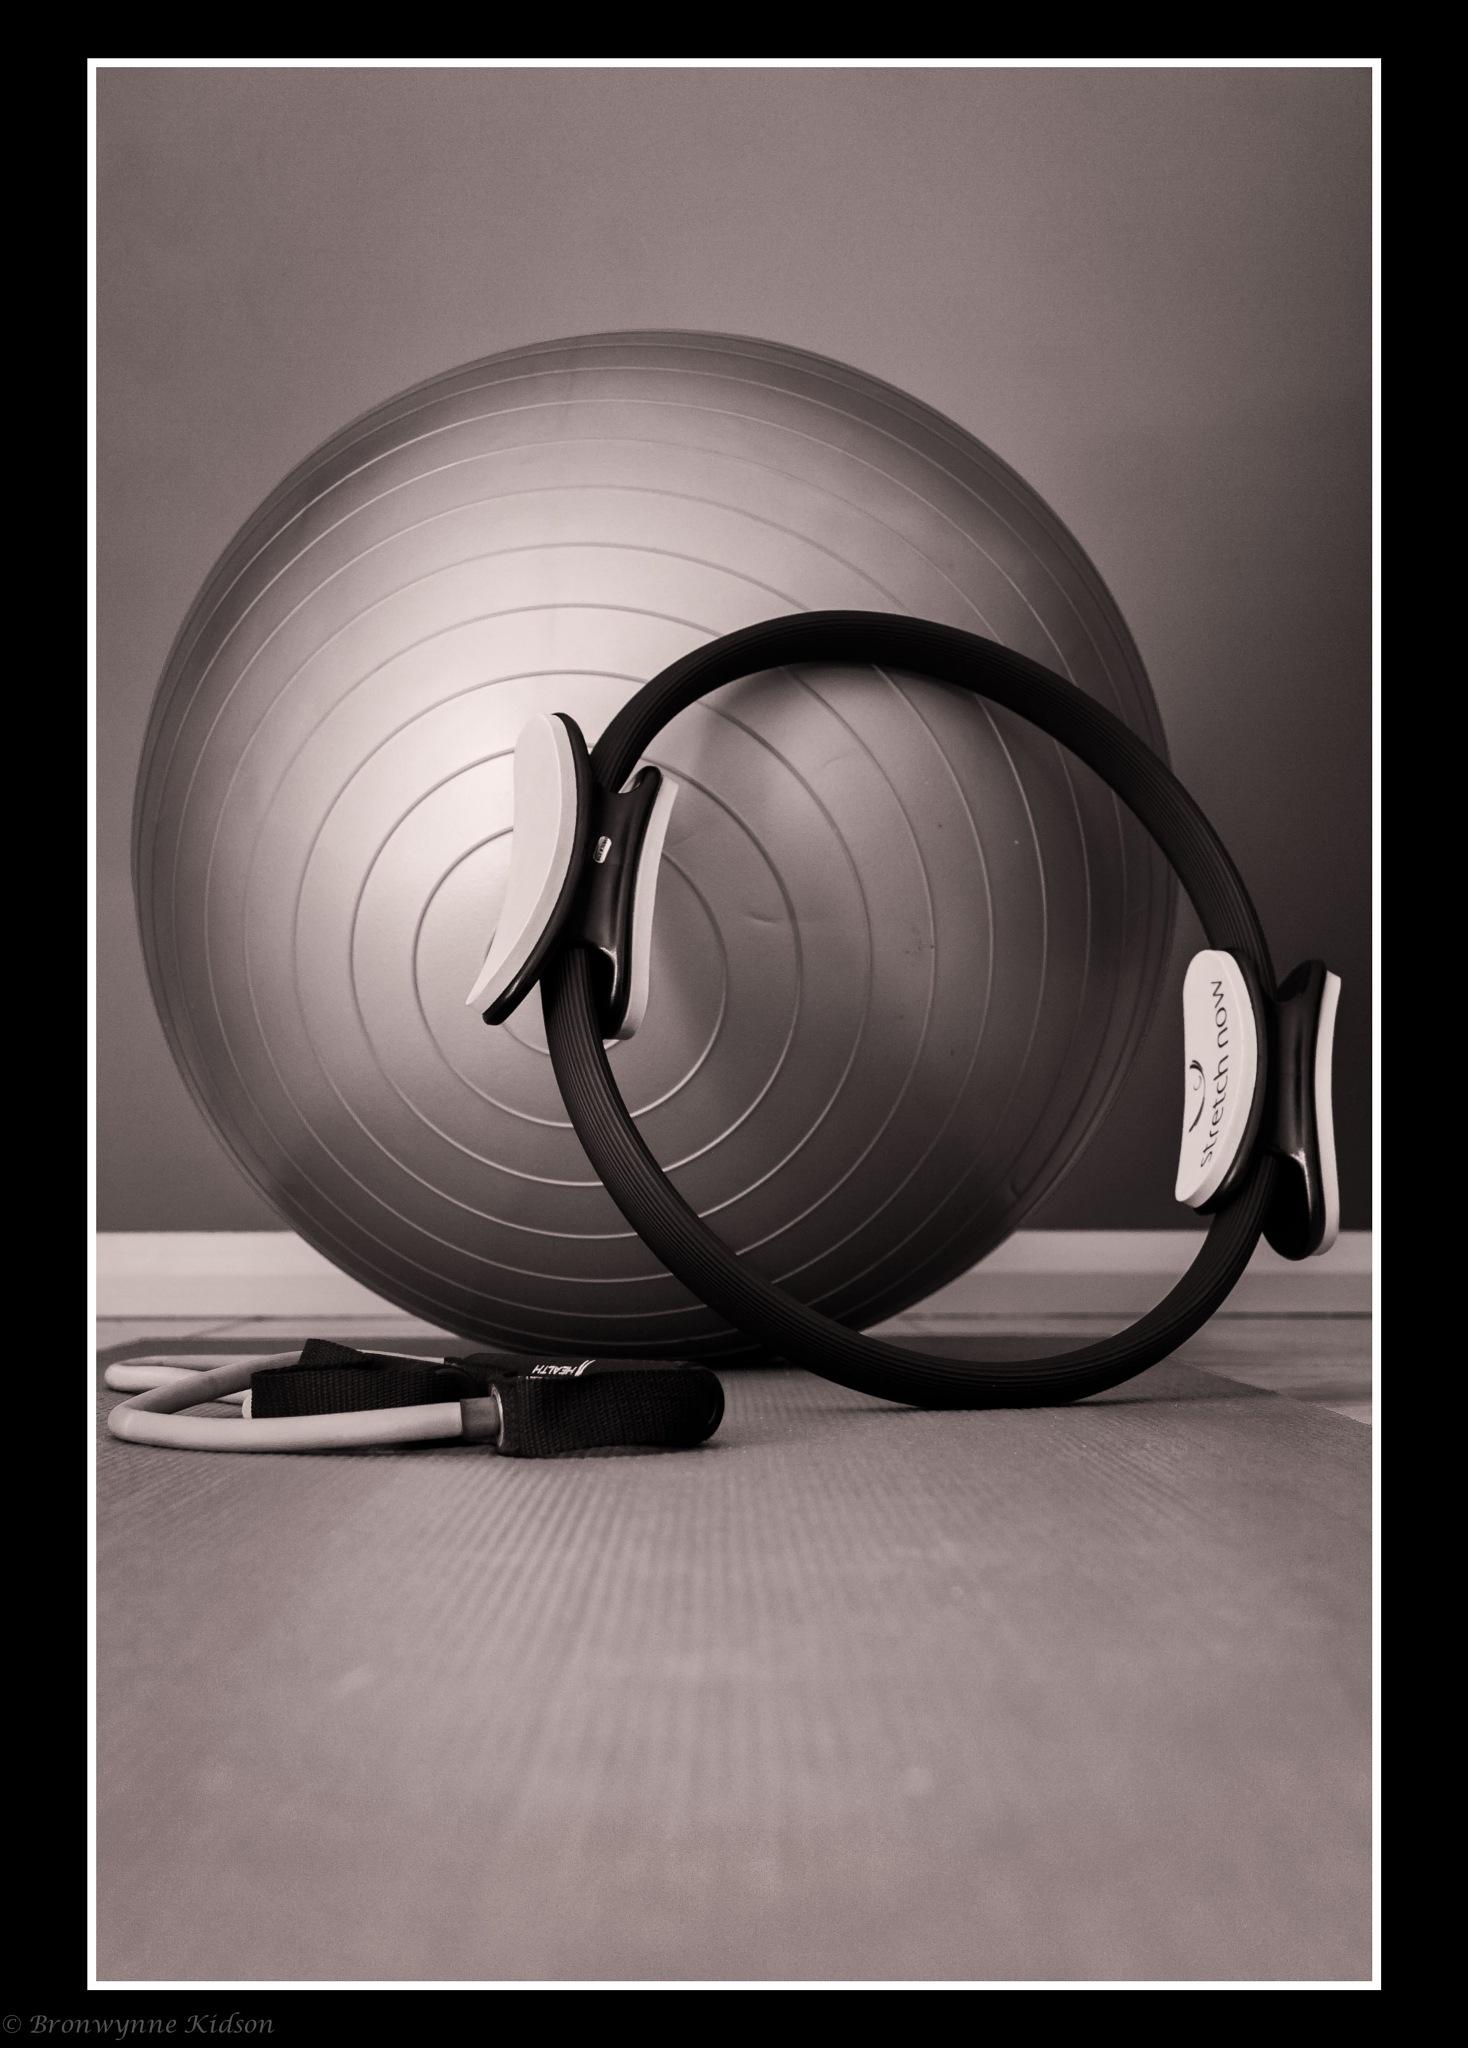 Pilates Anyone by Bronwynne Kidson